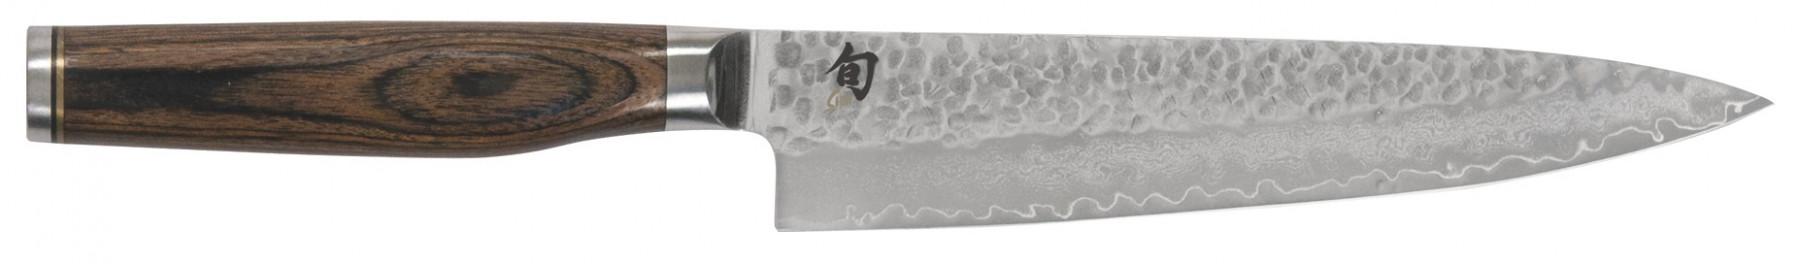 KAI Messerset Shun Premier TM II 2tlg. Allzweckmesser